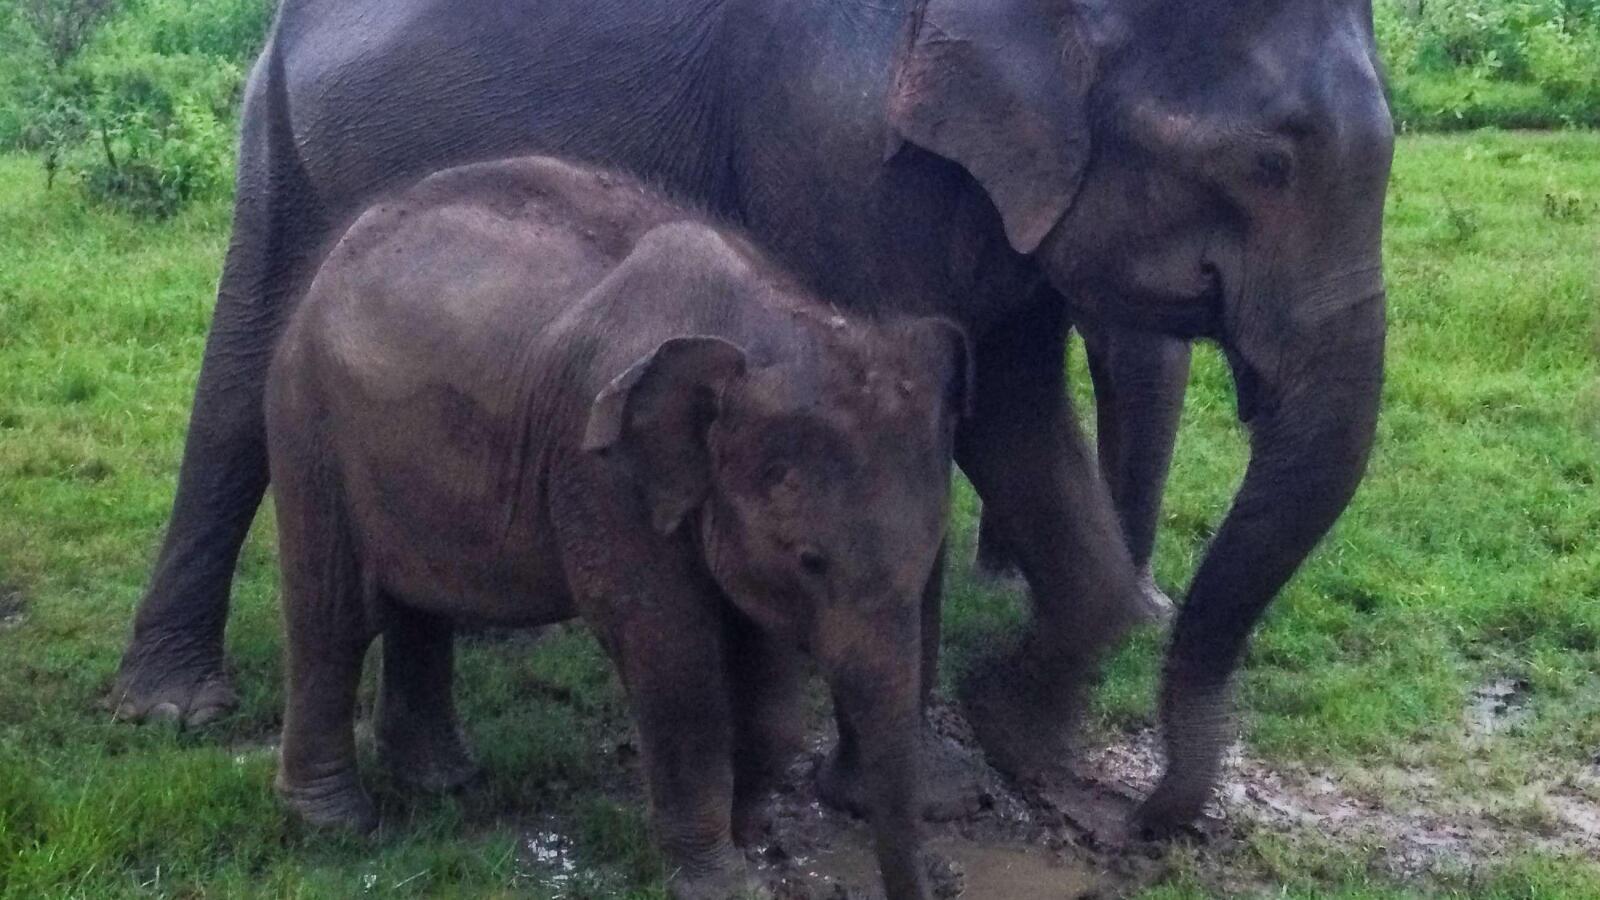 Elephant mum resting with her baby safari in sri lanka Udawalawe